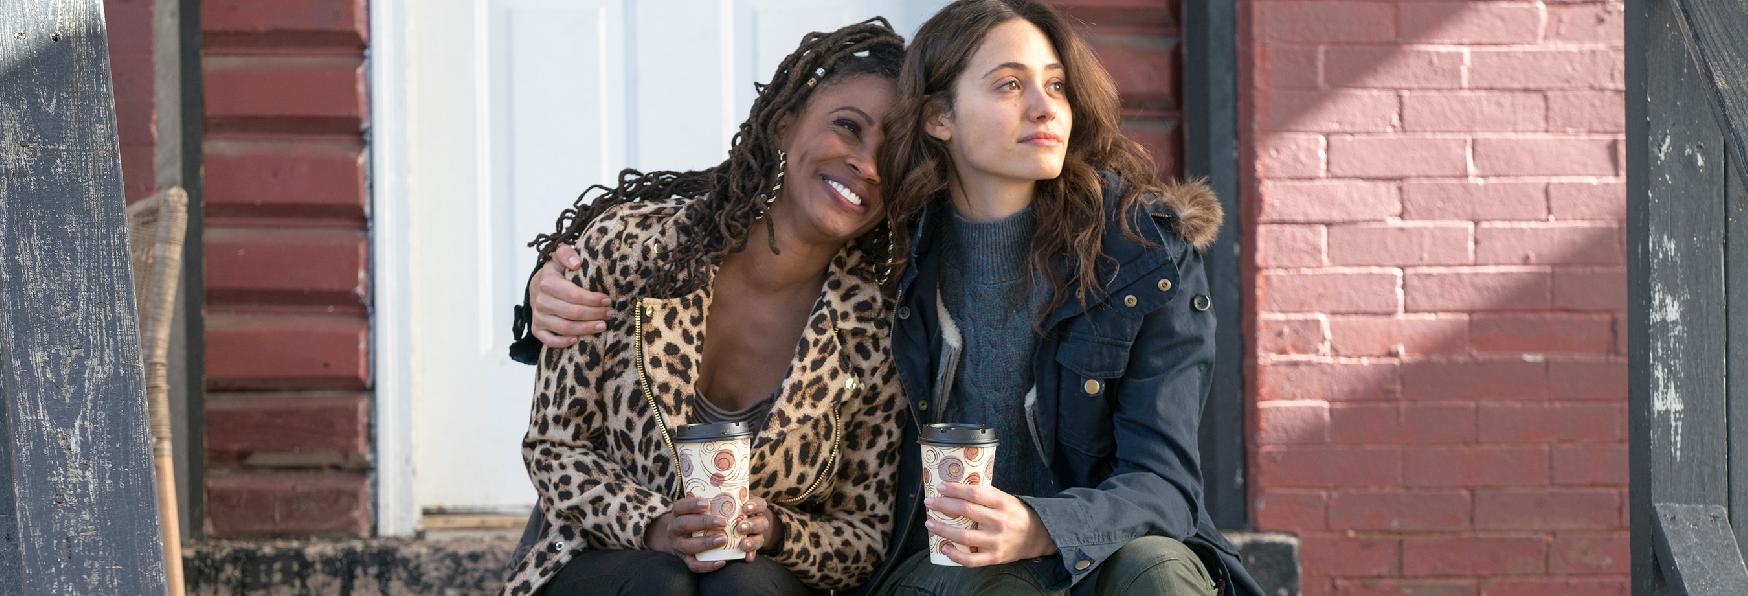 Shameless: l'Addio definitivo di Emmy Rossum a Fiona Gallegher